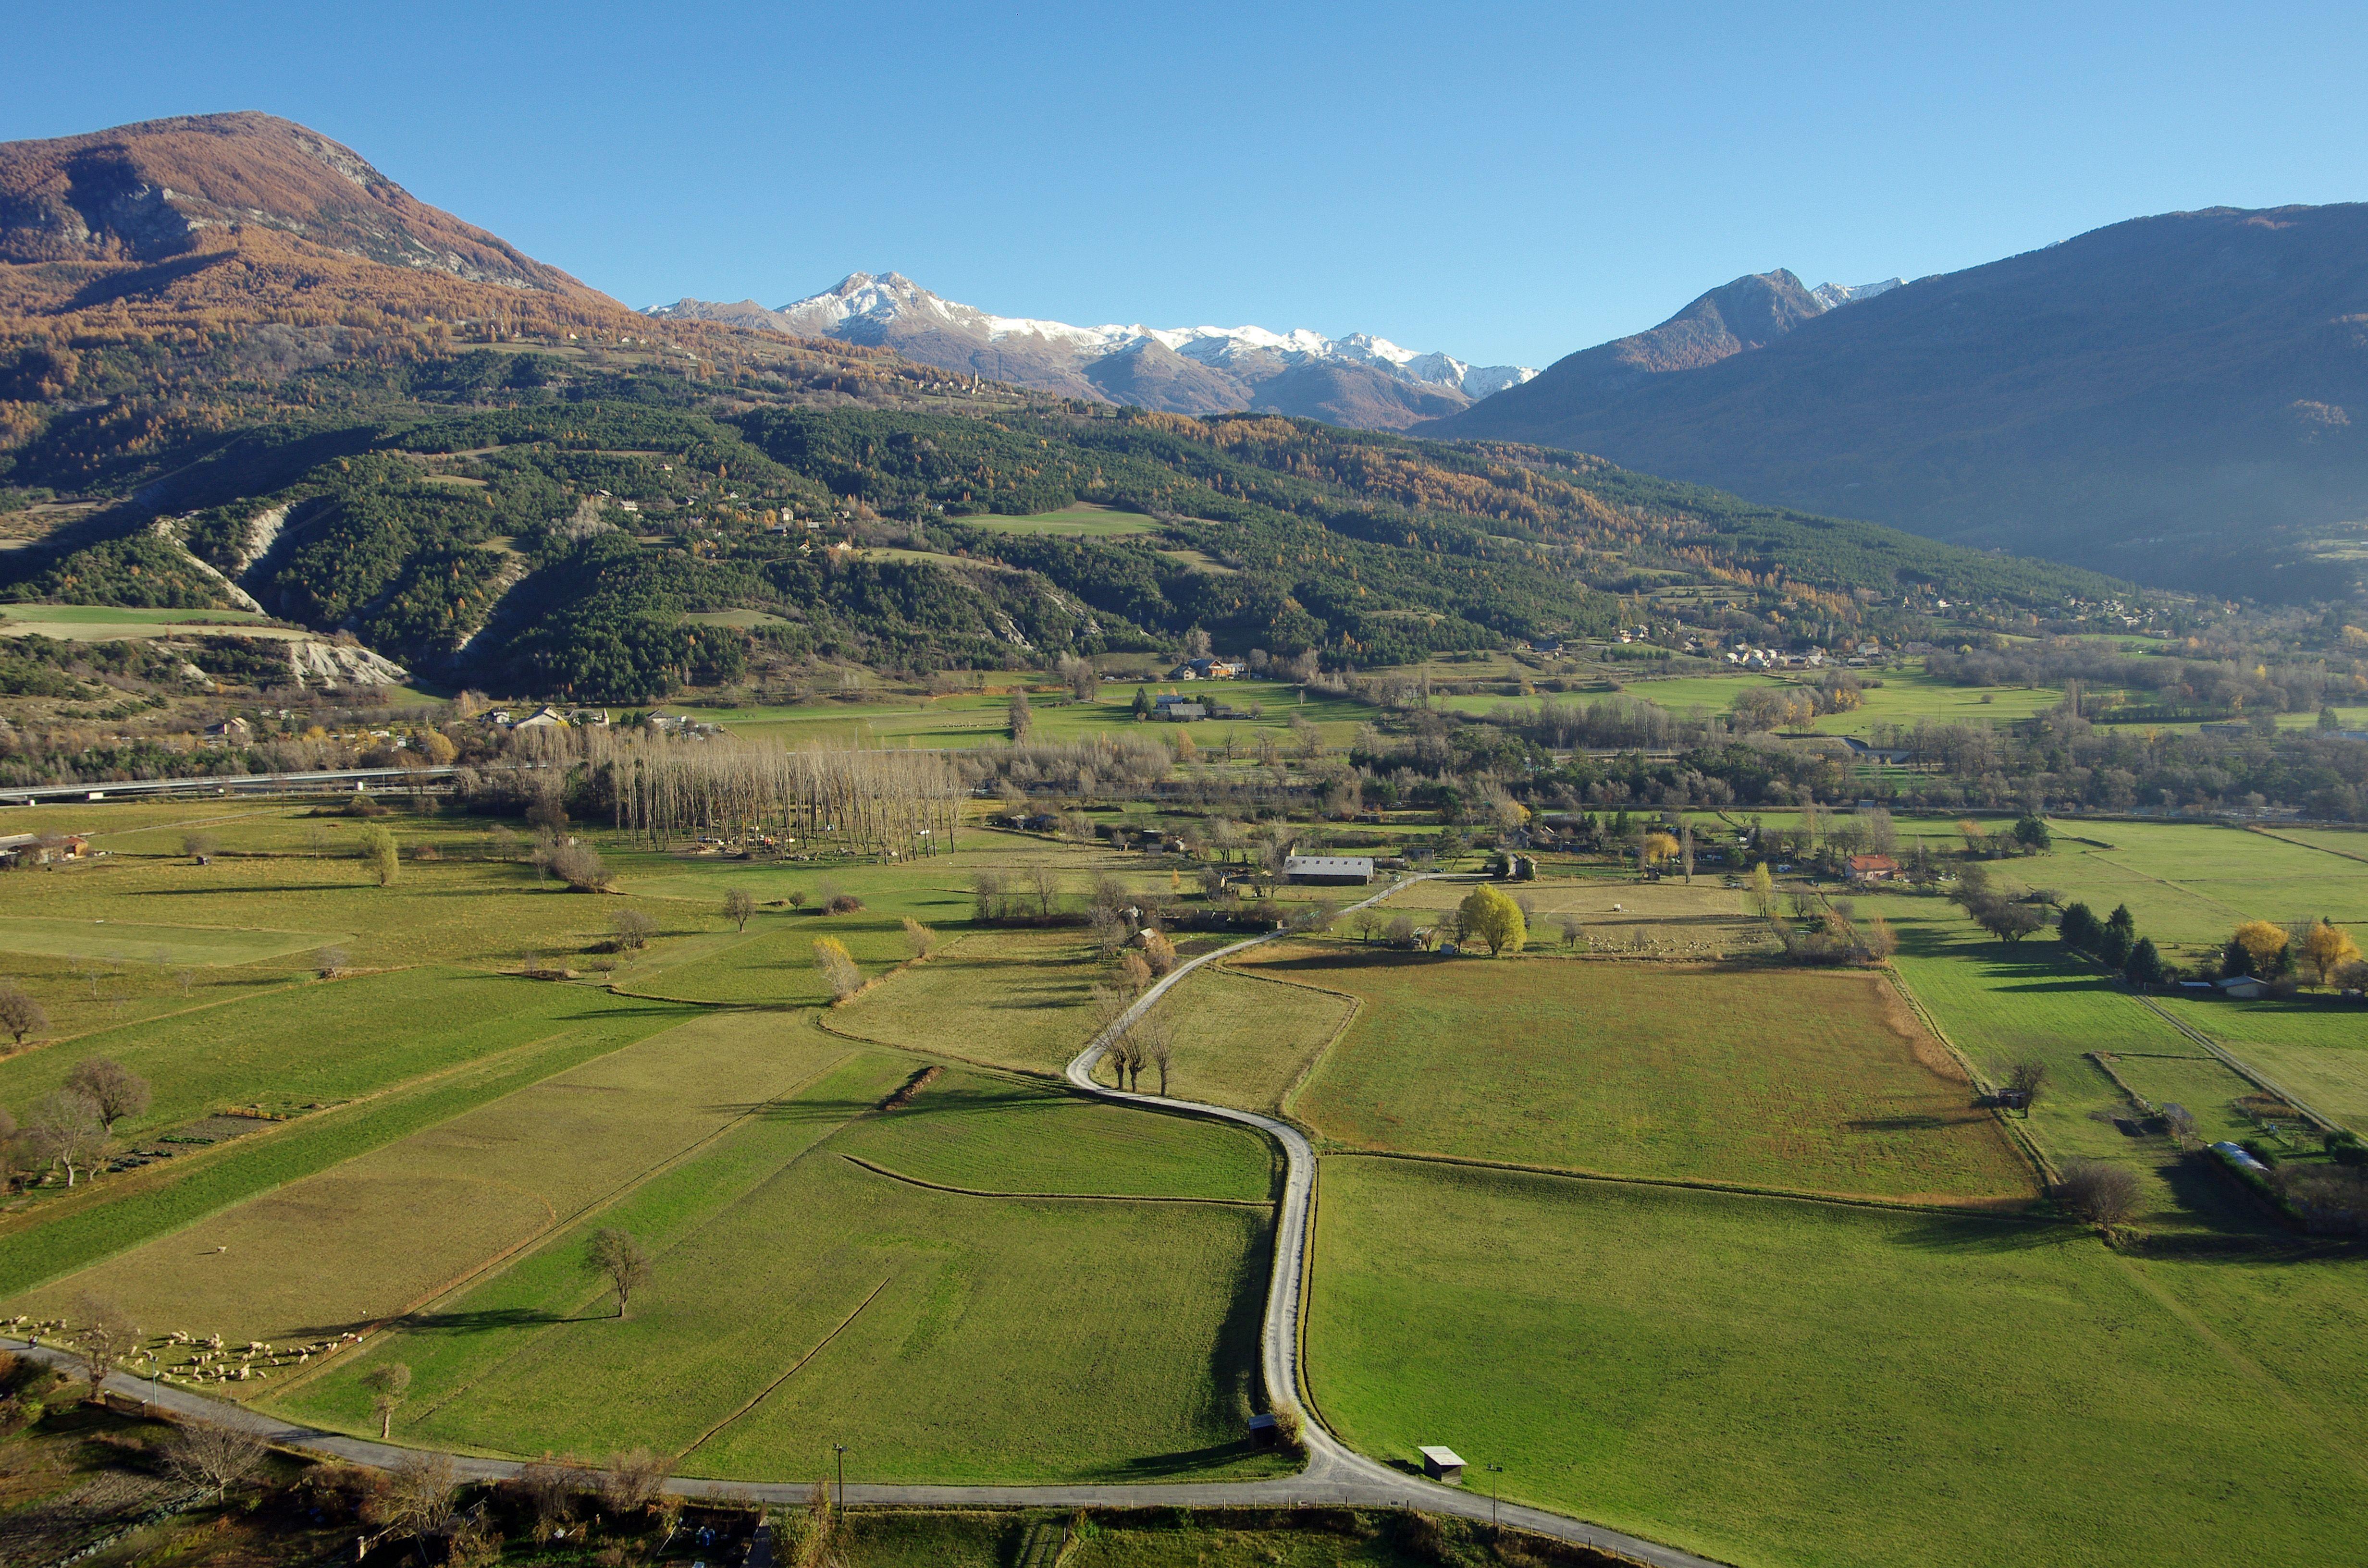 pin paysages montagne fond - photo #38